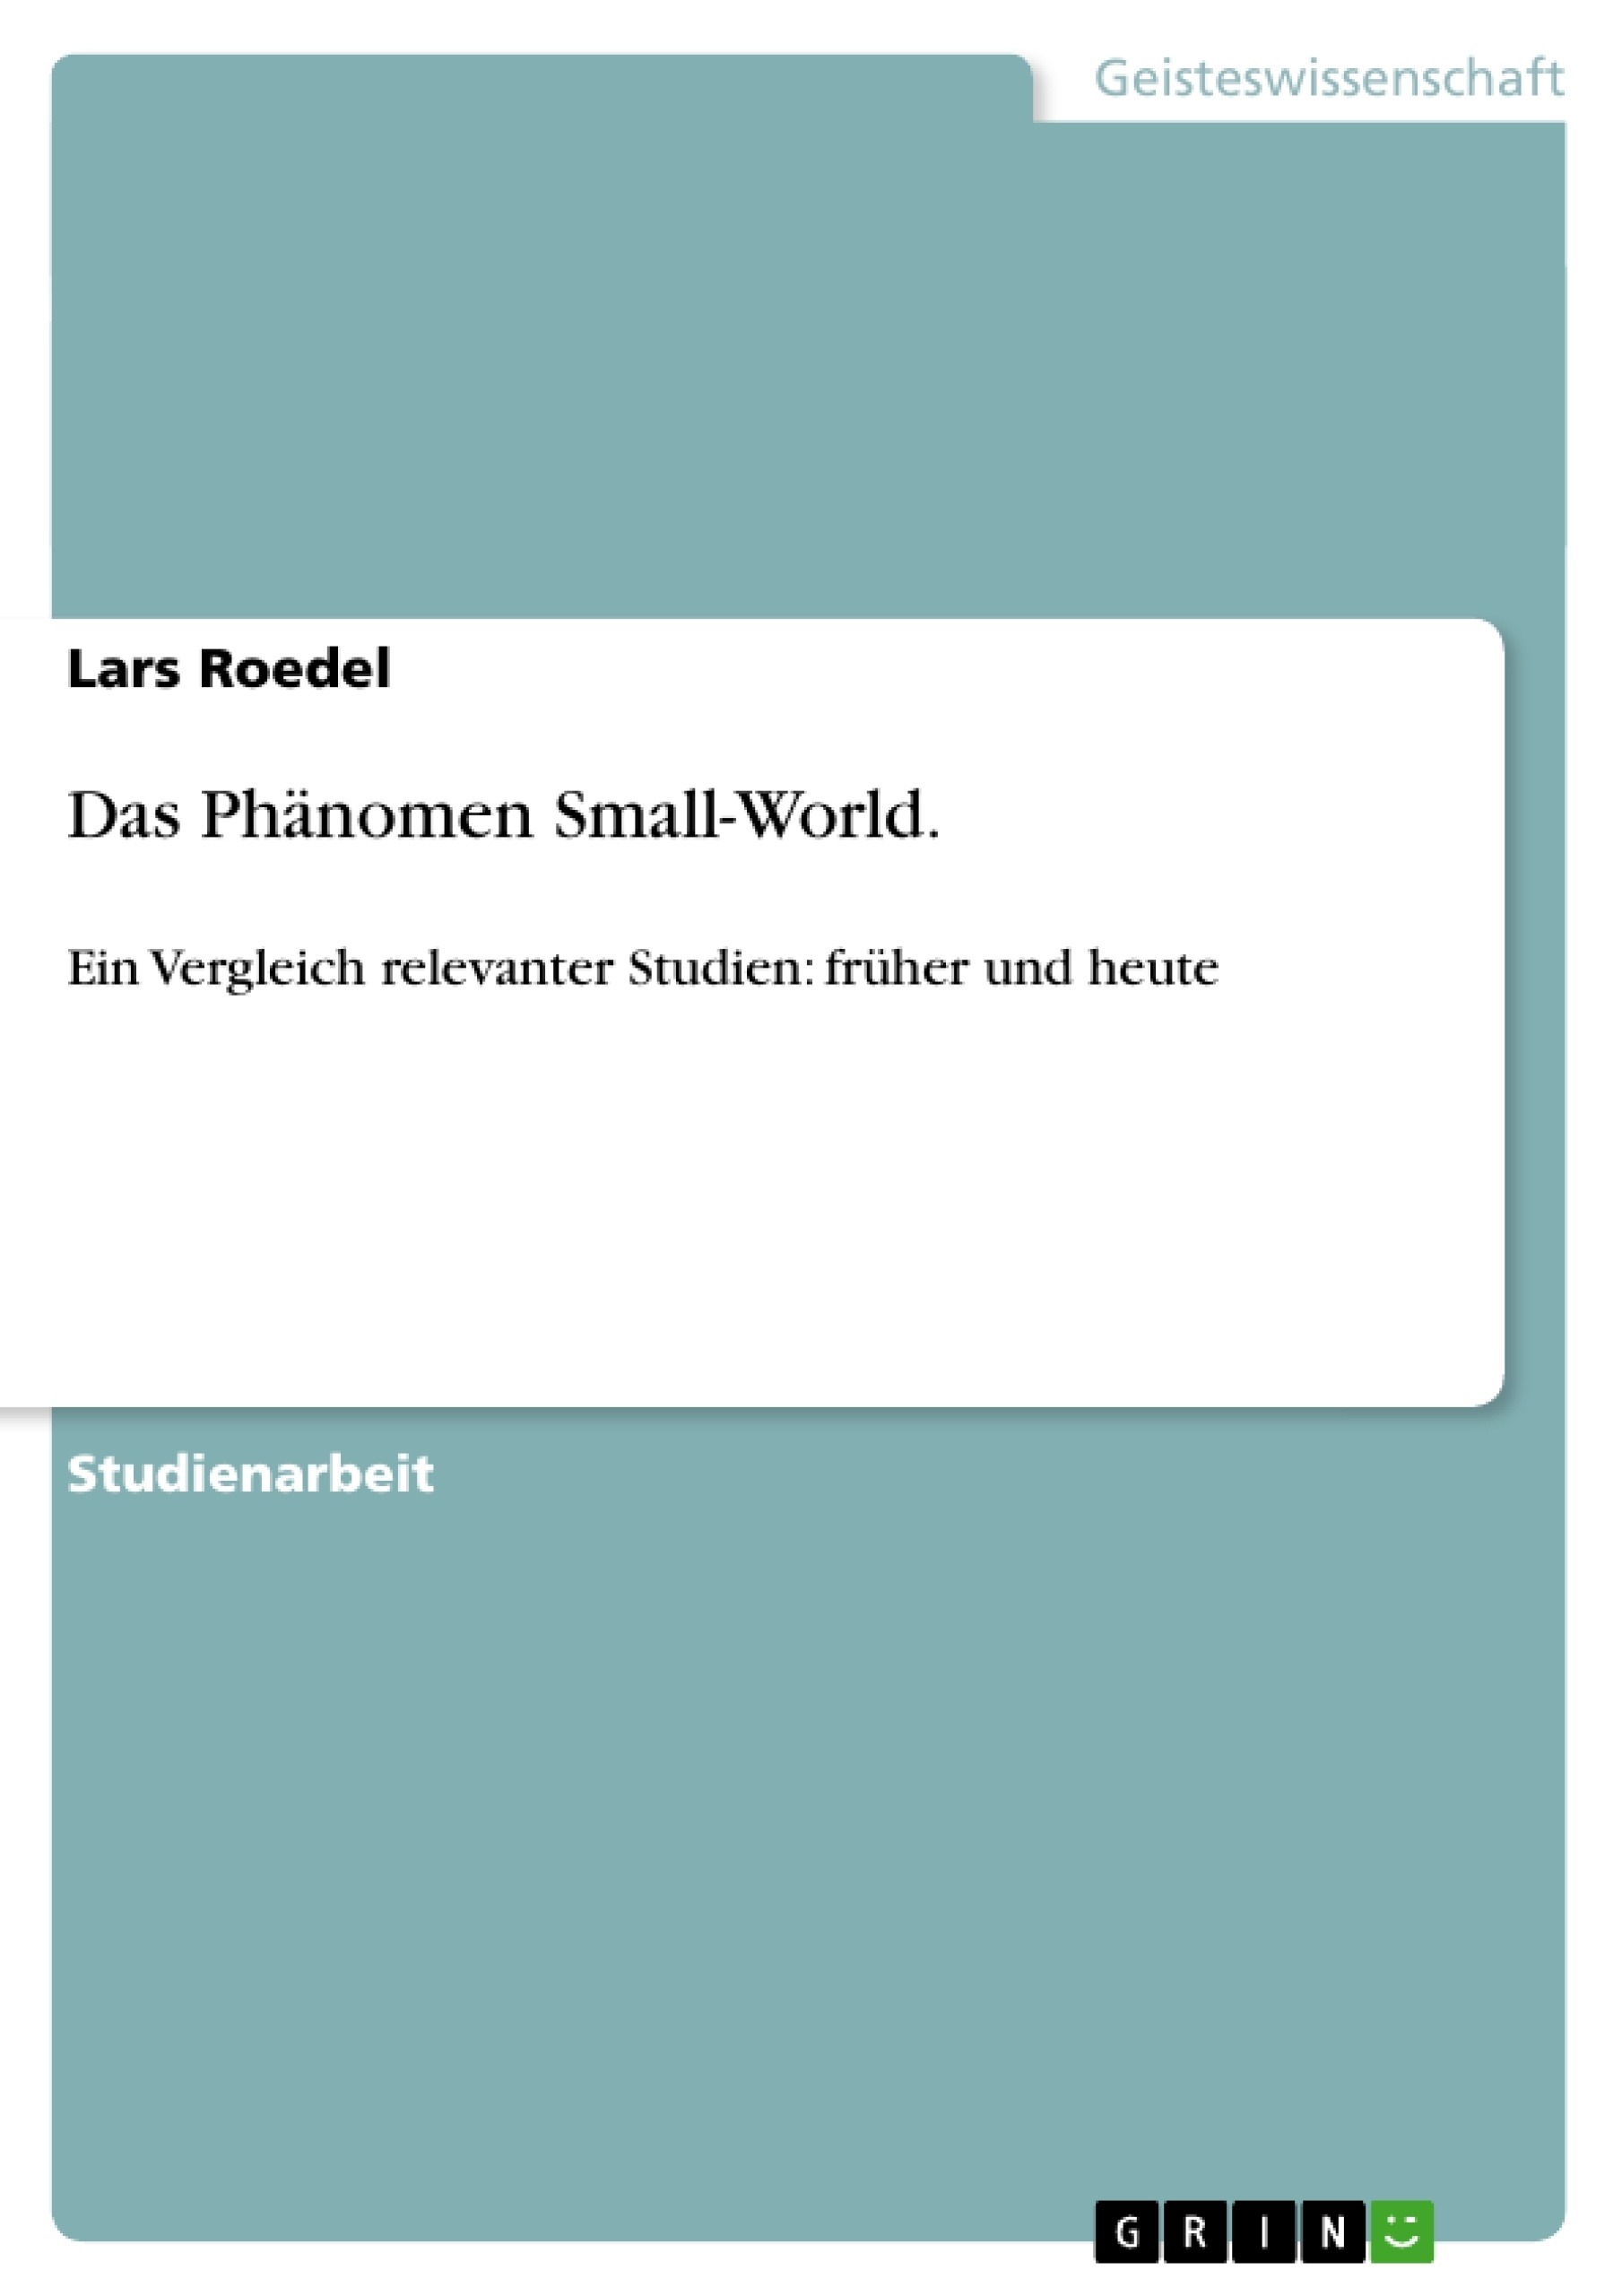 Titel: Das Phänomen Small-World.